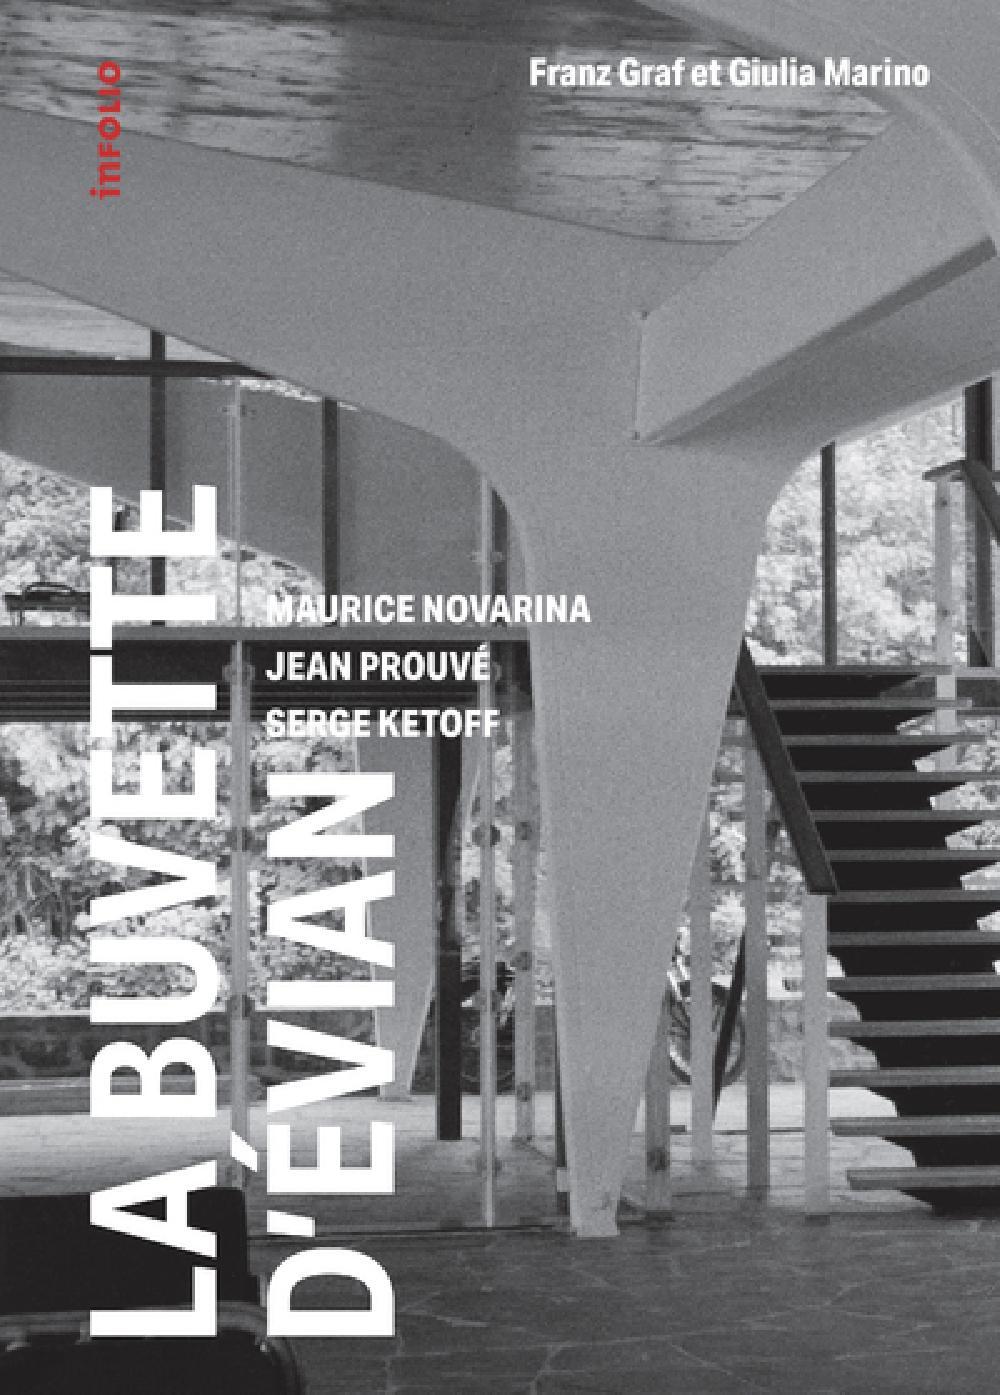 La buvette d'Evian / Maurice Novarina, Jean Prouvé, Serge Ketoff (1955-2018)